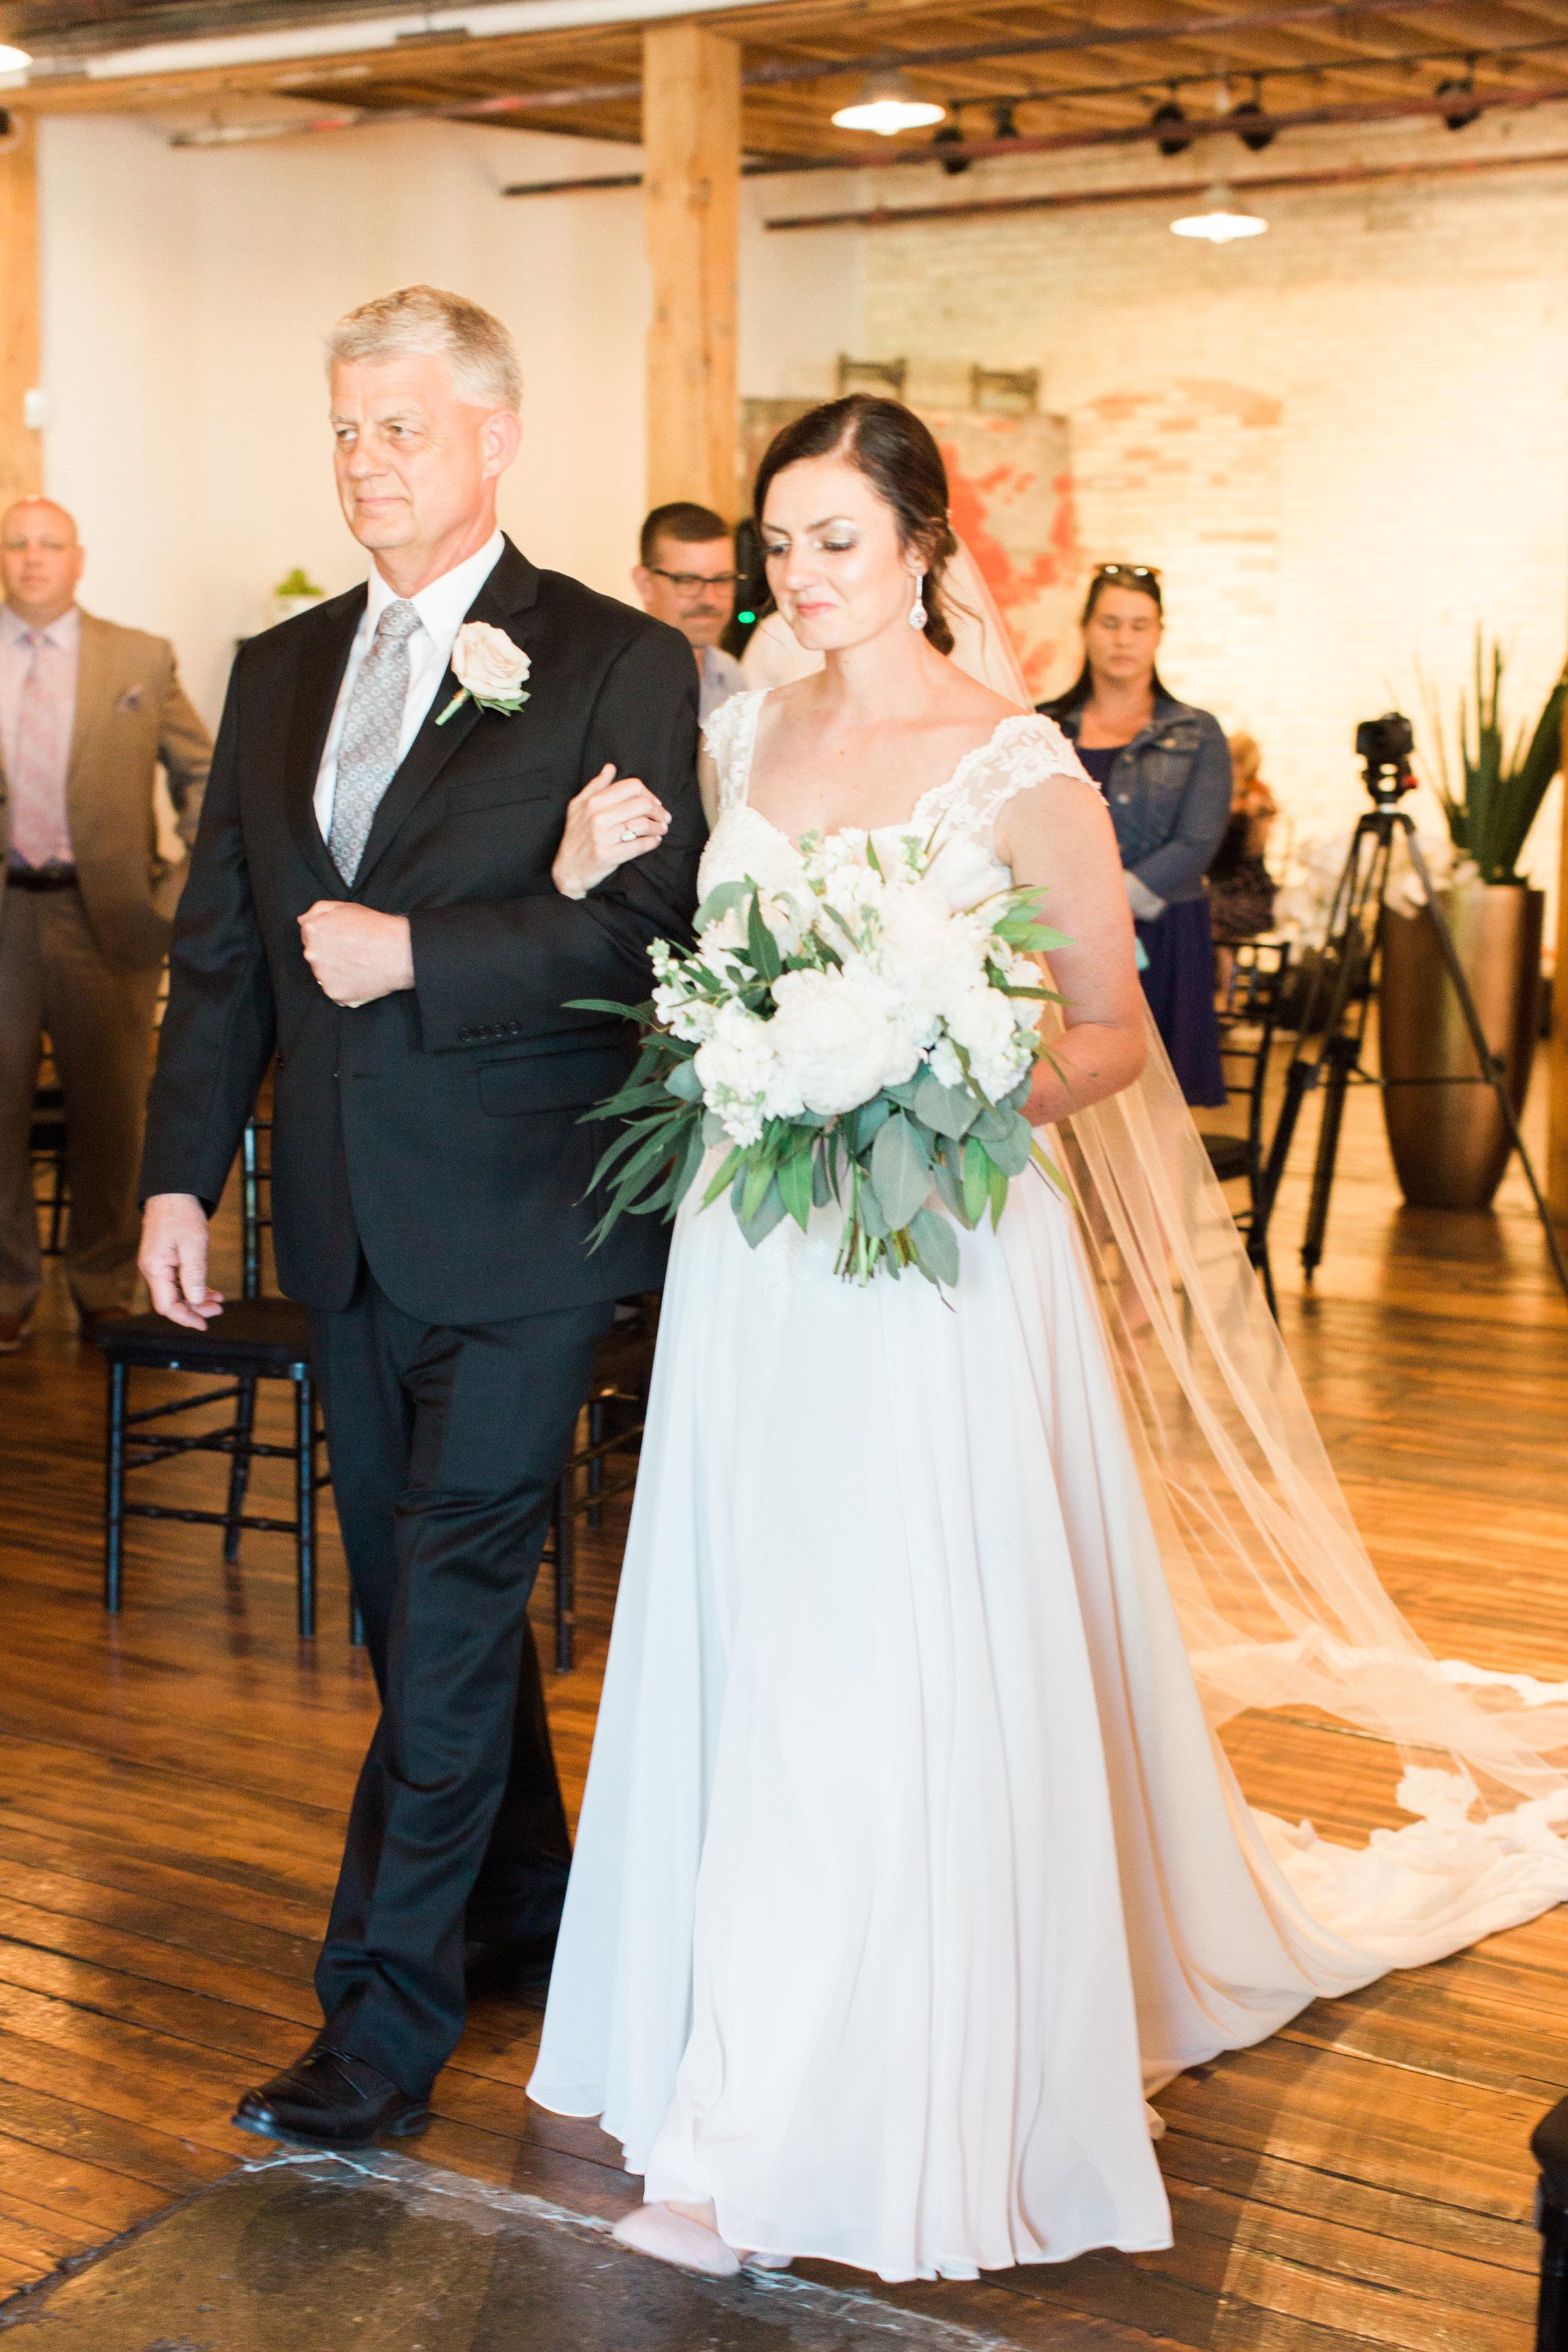 Julius+Wedding+Ceremony-49.jpg